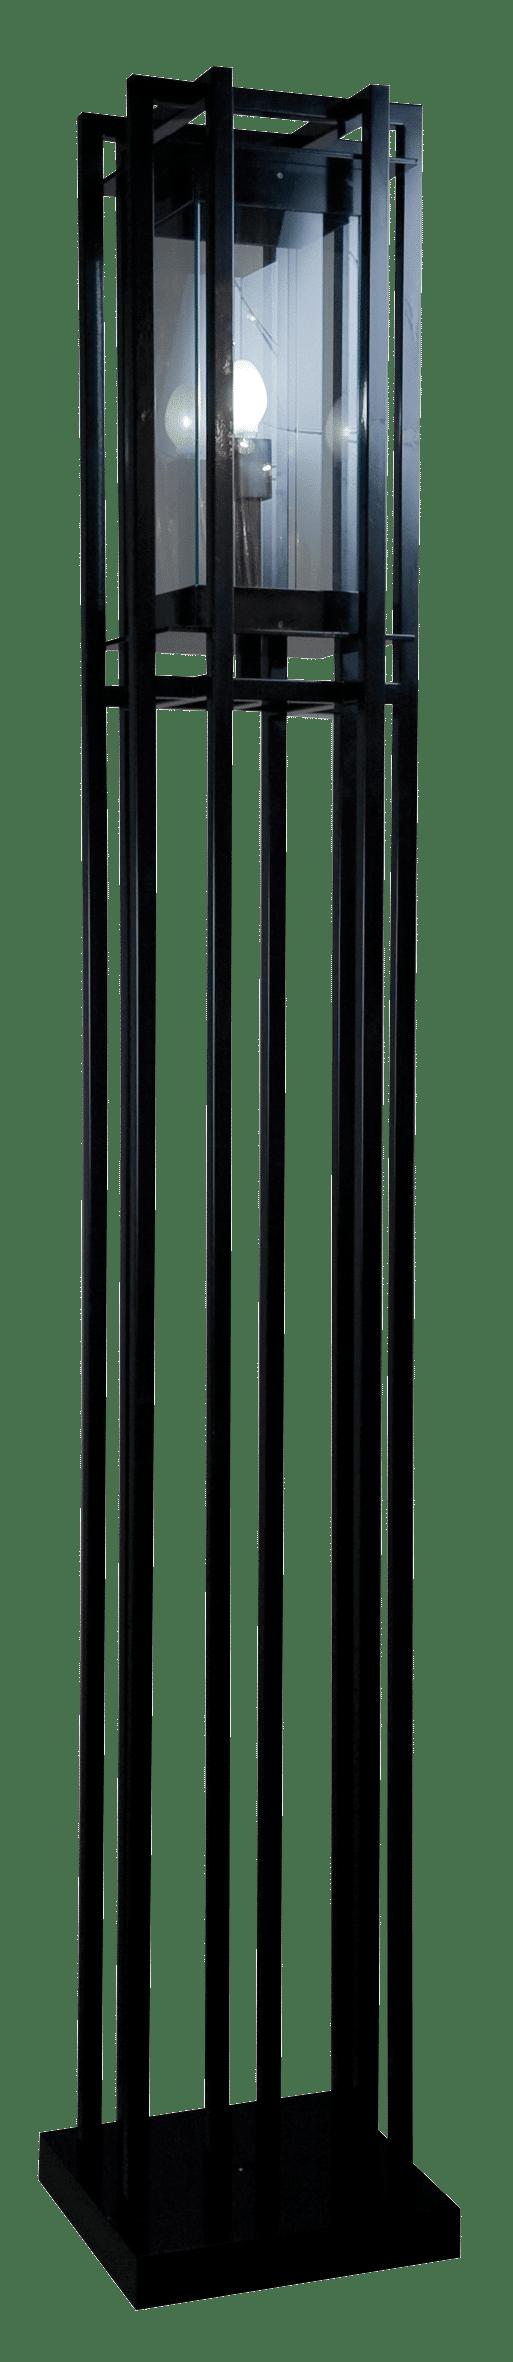 Costa laterna lungo Design by Marcel Wolterinck 230v Zwart